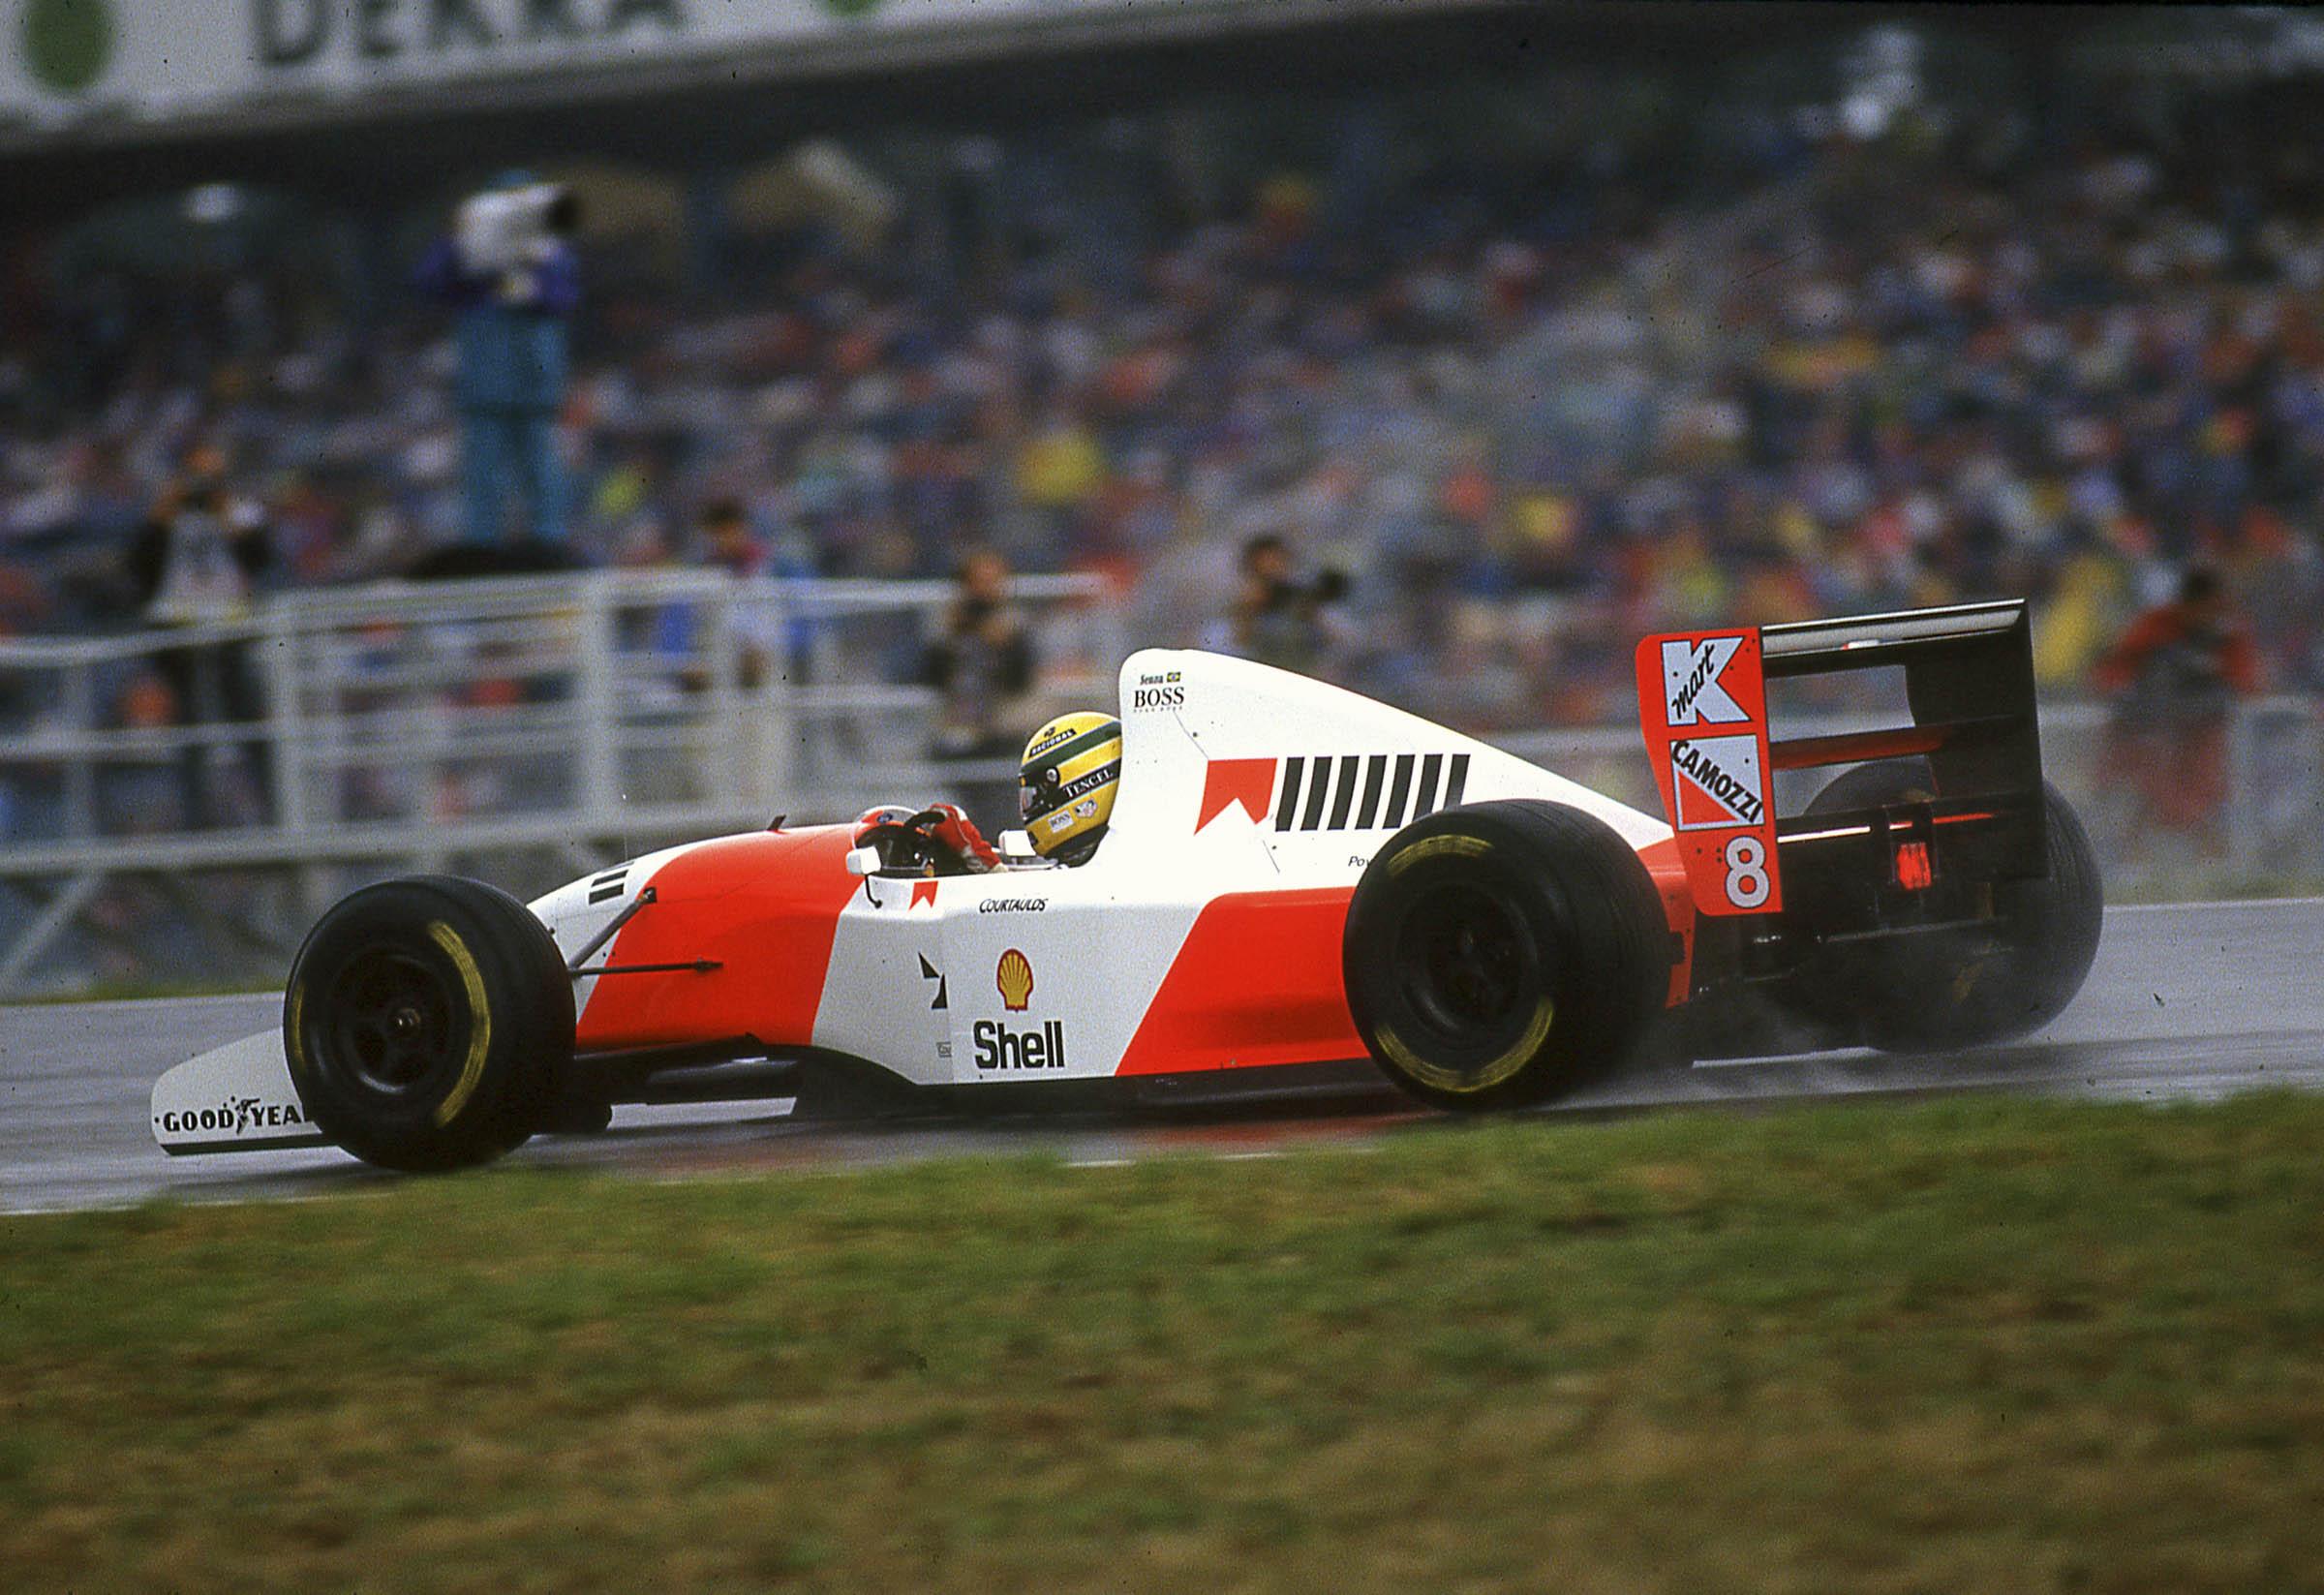 Senna's 1993 McLaren MP4/8A Chassis no. 6